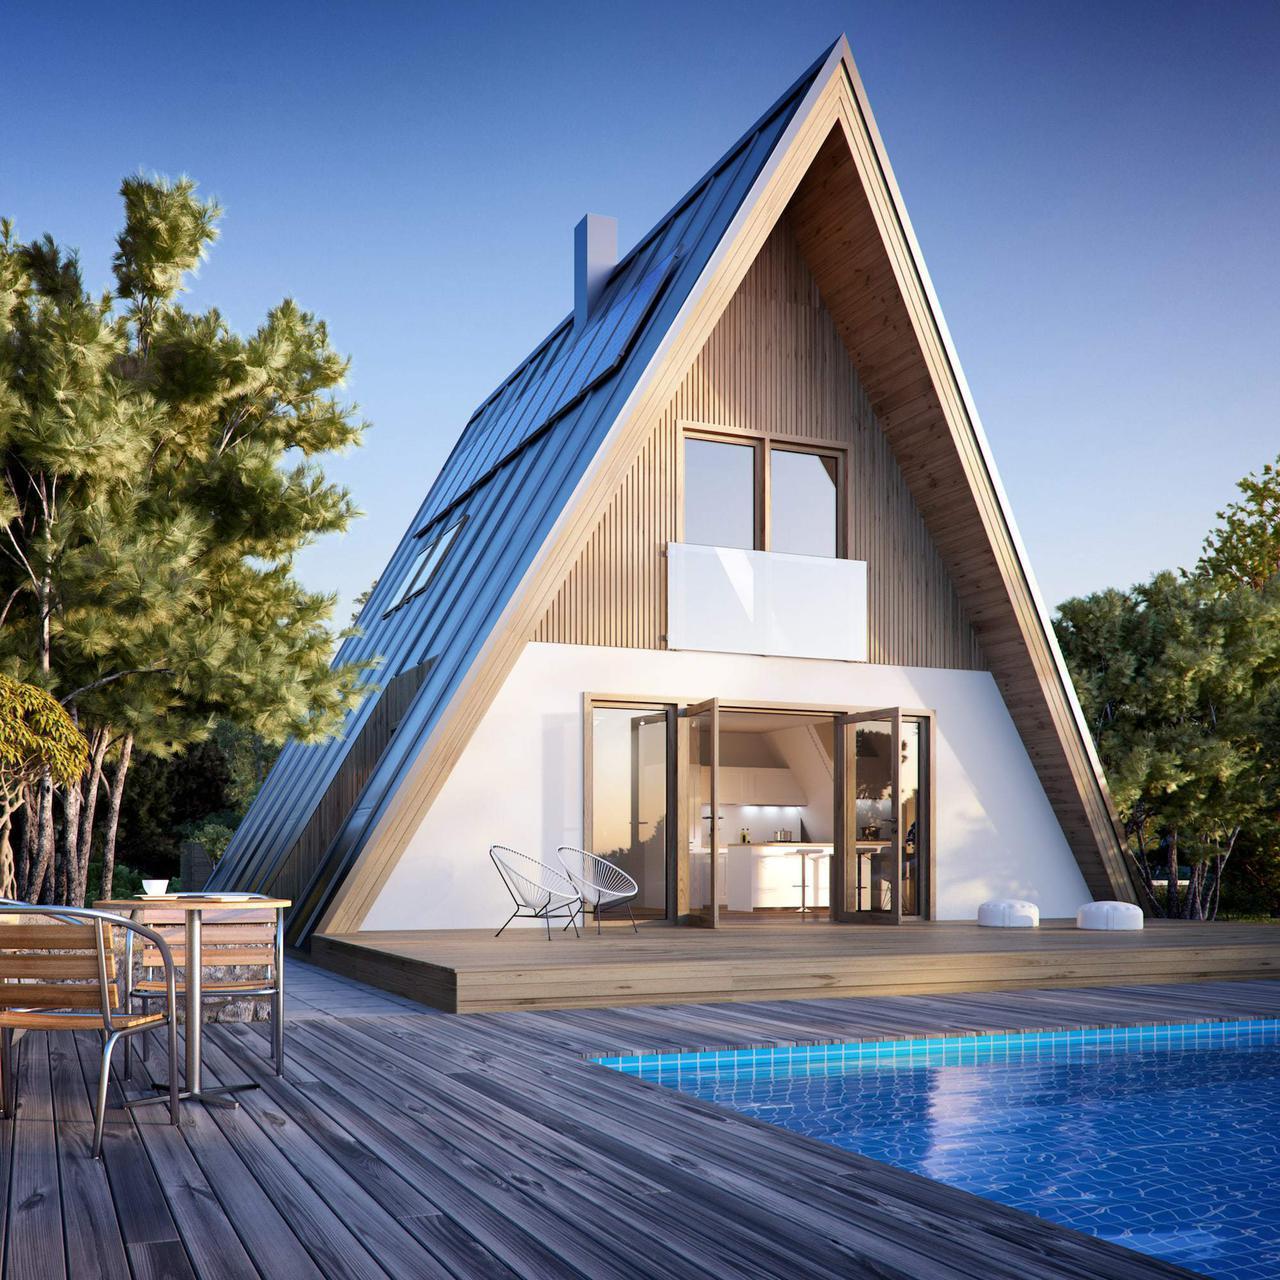 A-frame homes